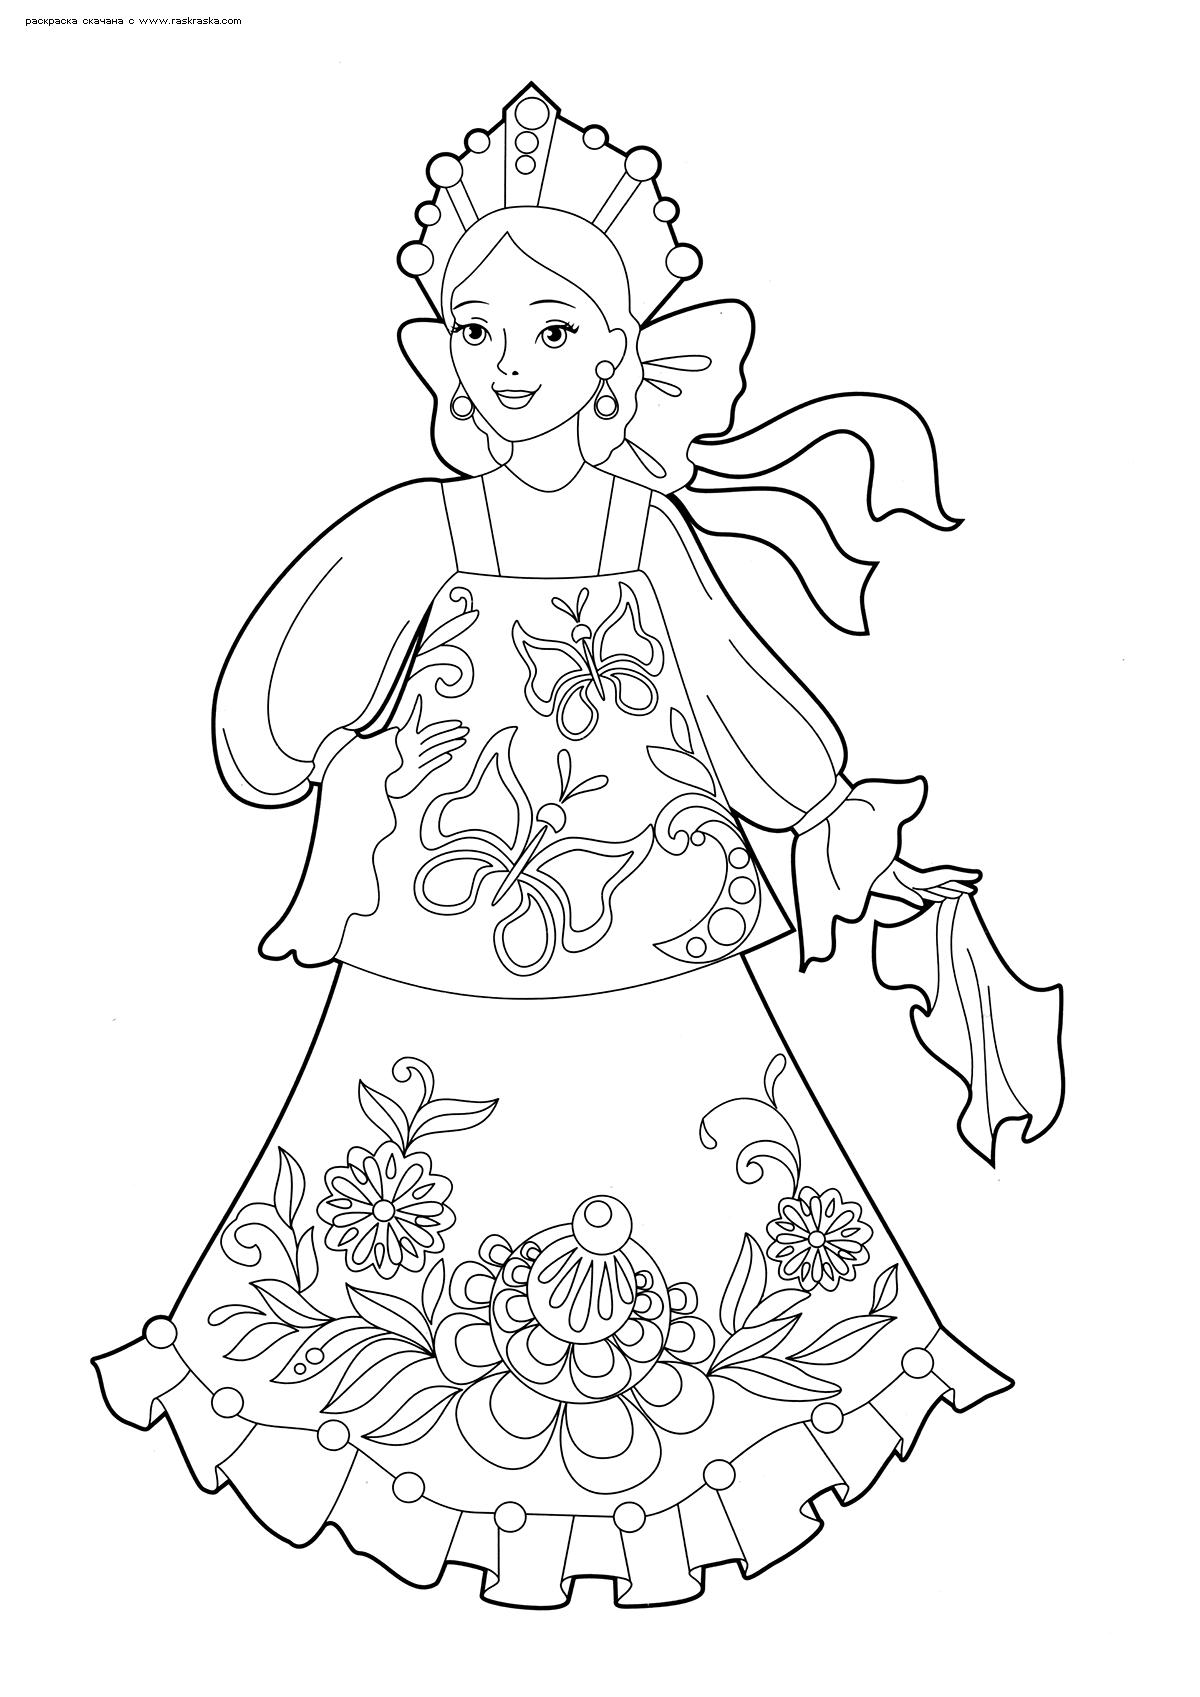 Раскраска Девушка в русском наряде. Раскраска девушка, красавица